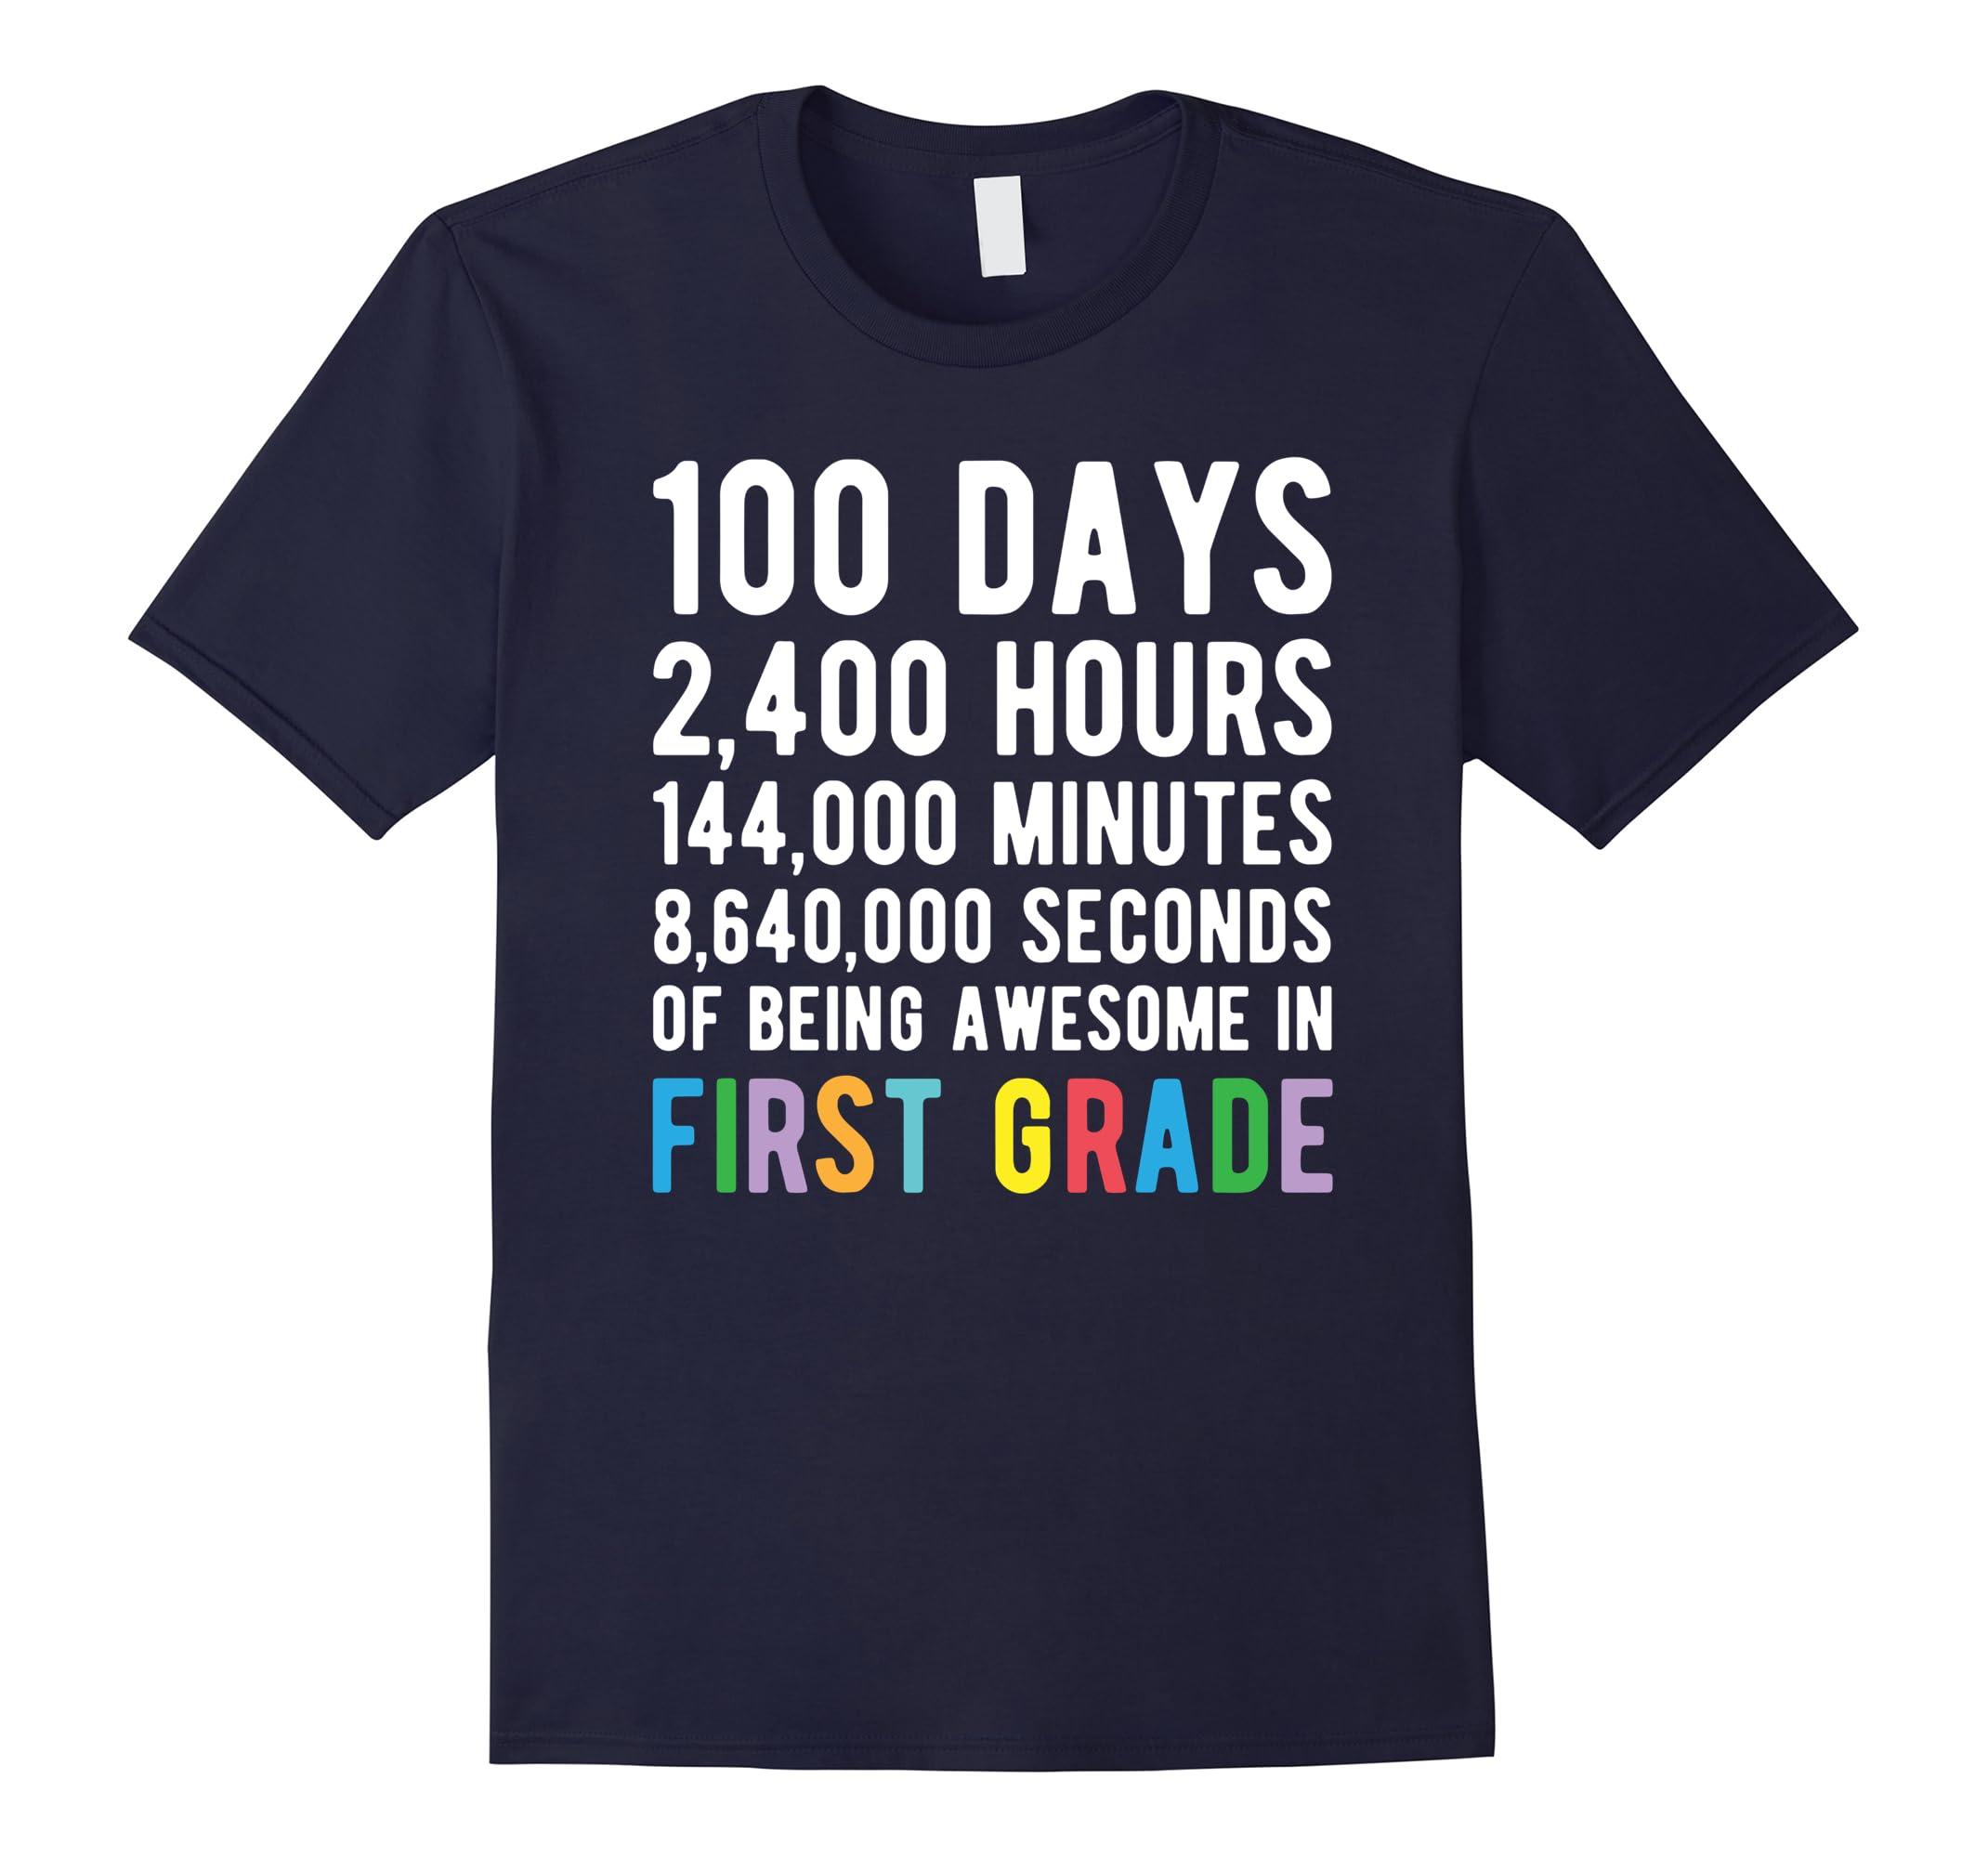 100 Days of School Shirt First Grade 100 Day Countdown-RT